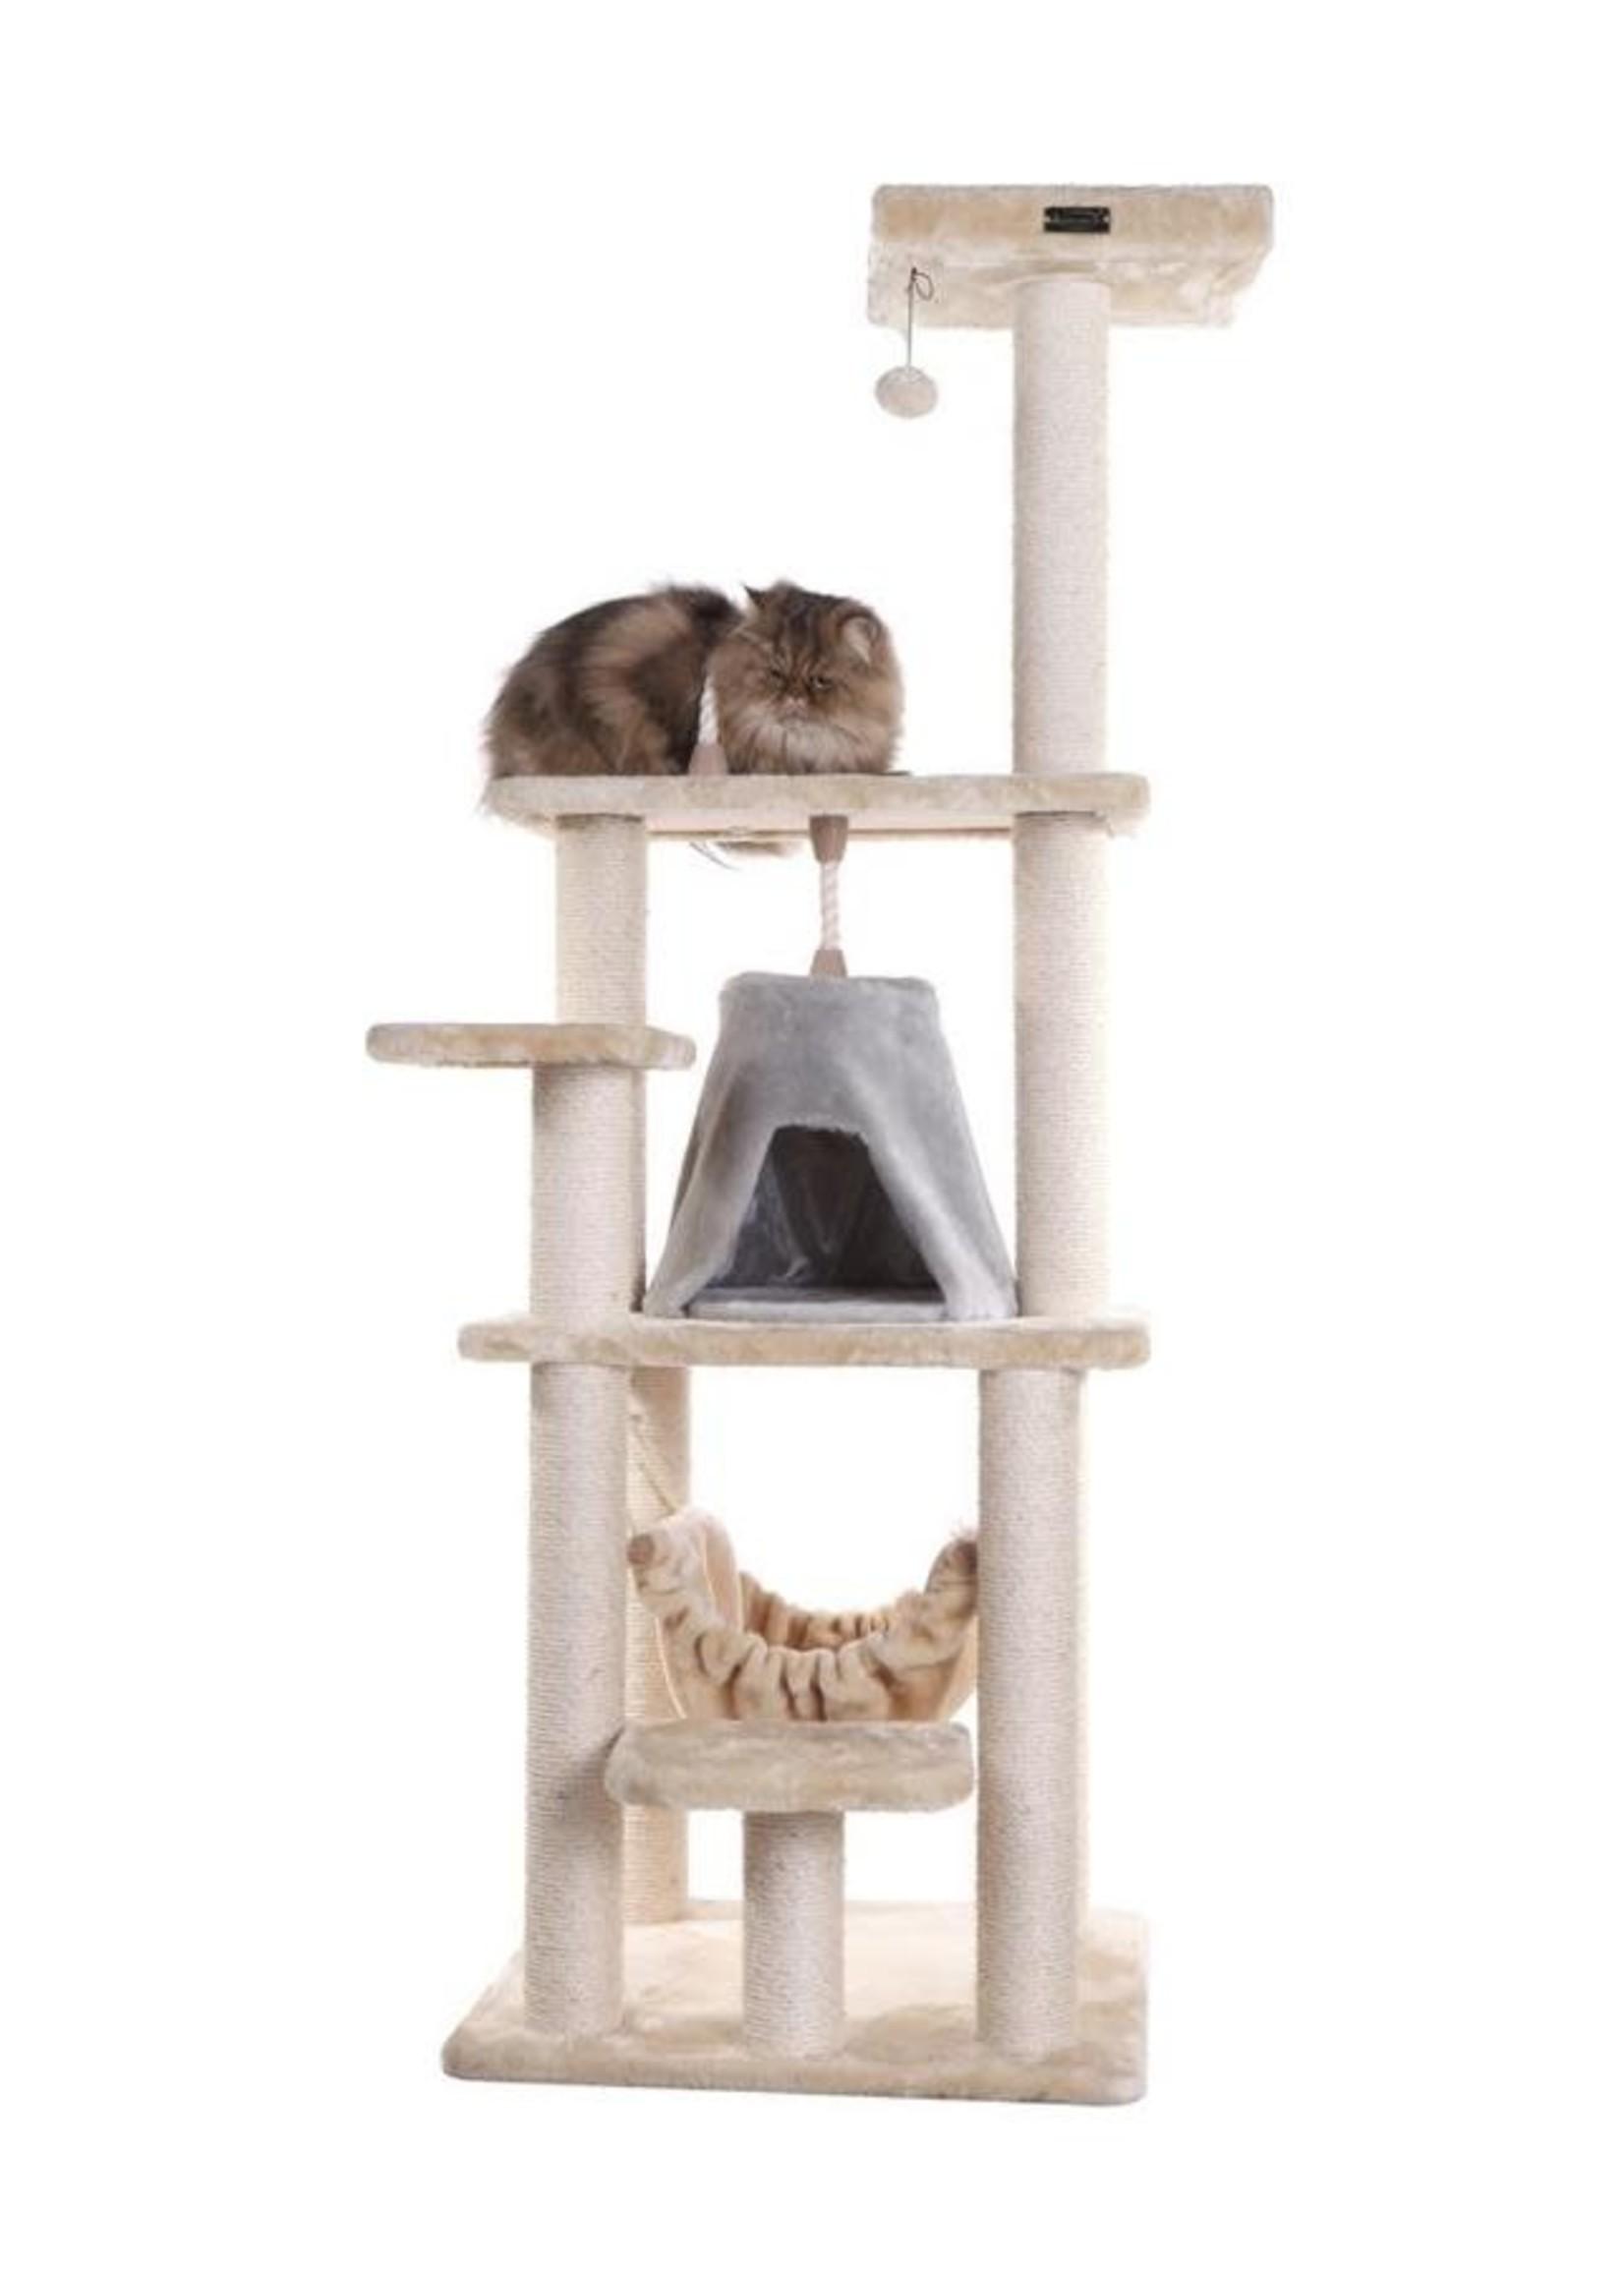 "Armarkat Armarkat 65"" Cat Tree w/Sisal Rope, Hammock"